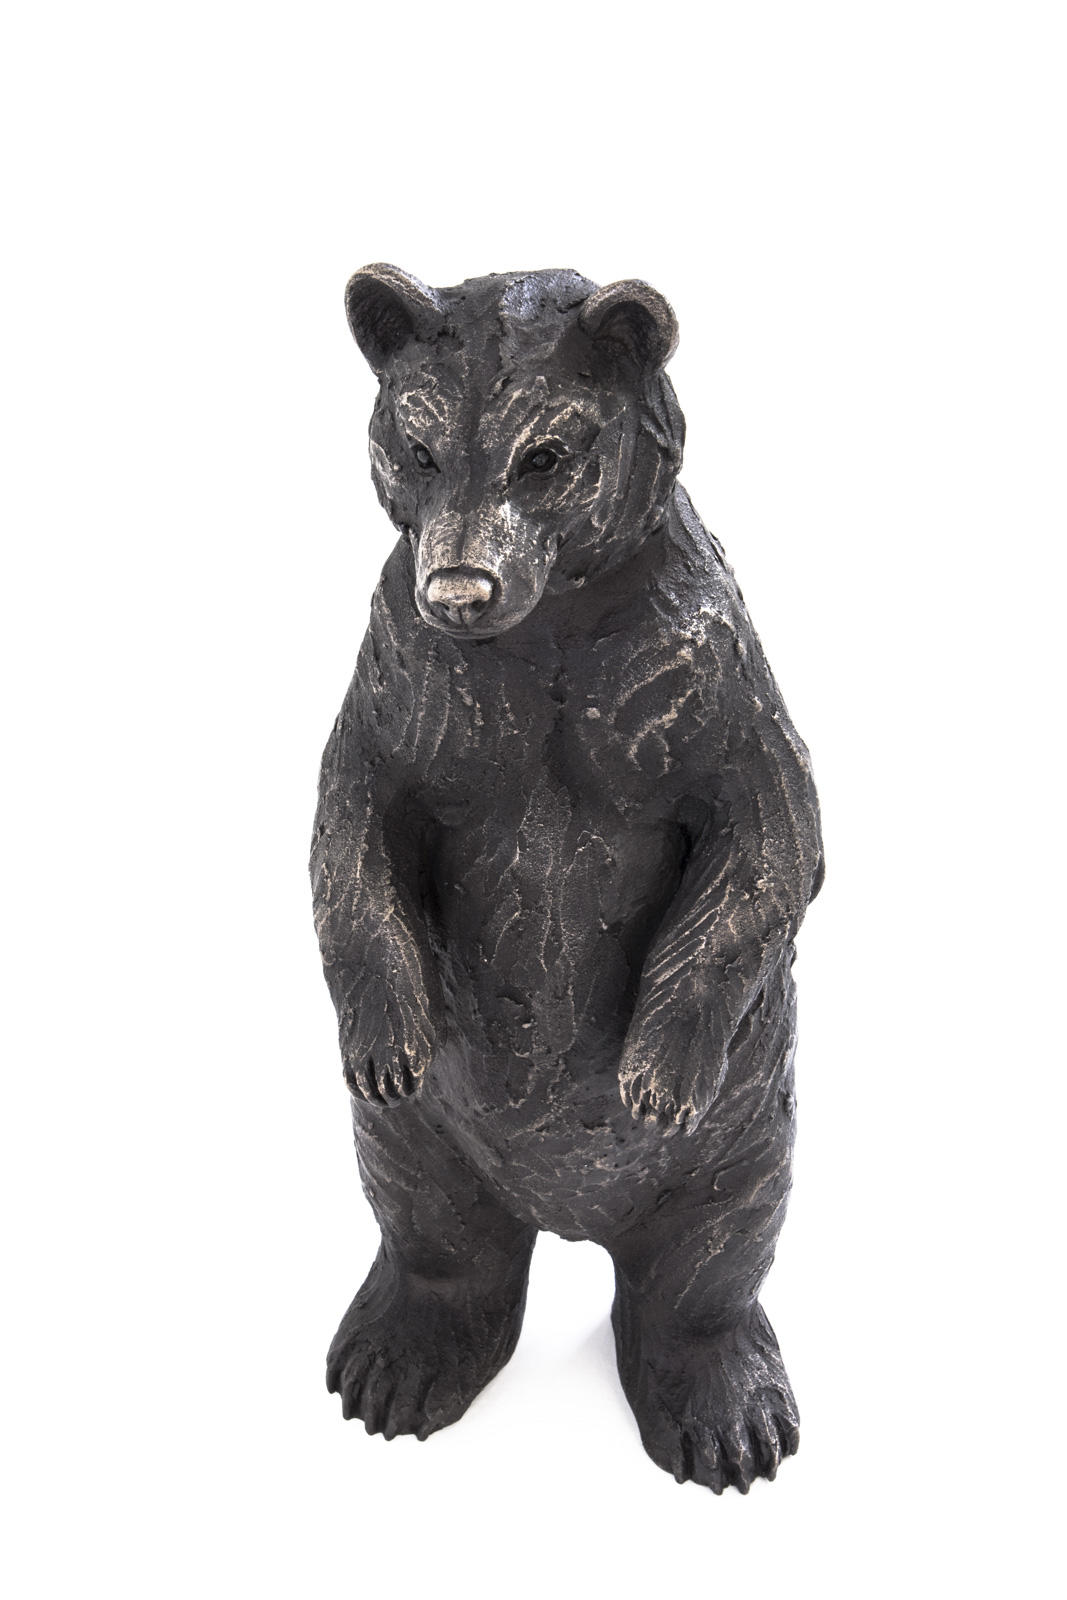 Henry Standing Bear Cub